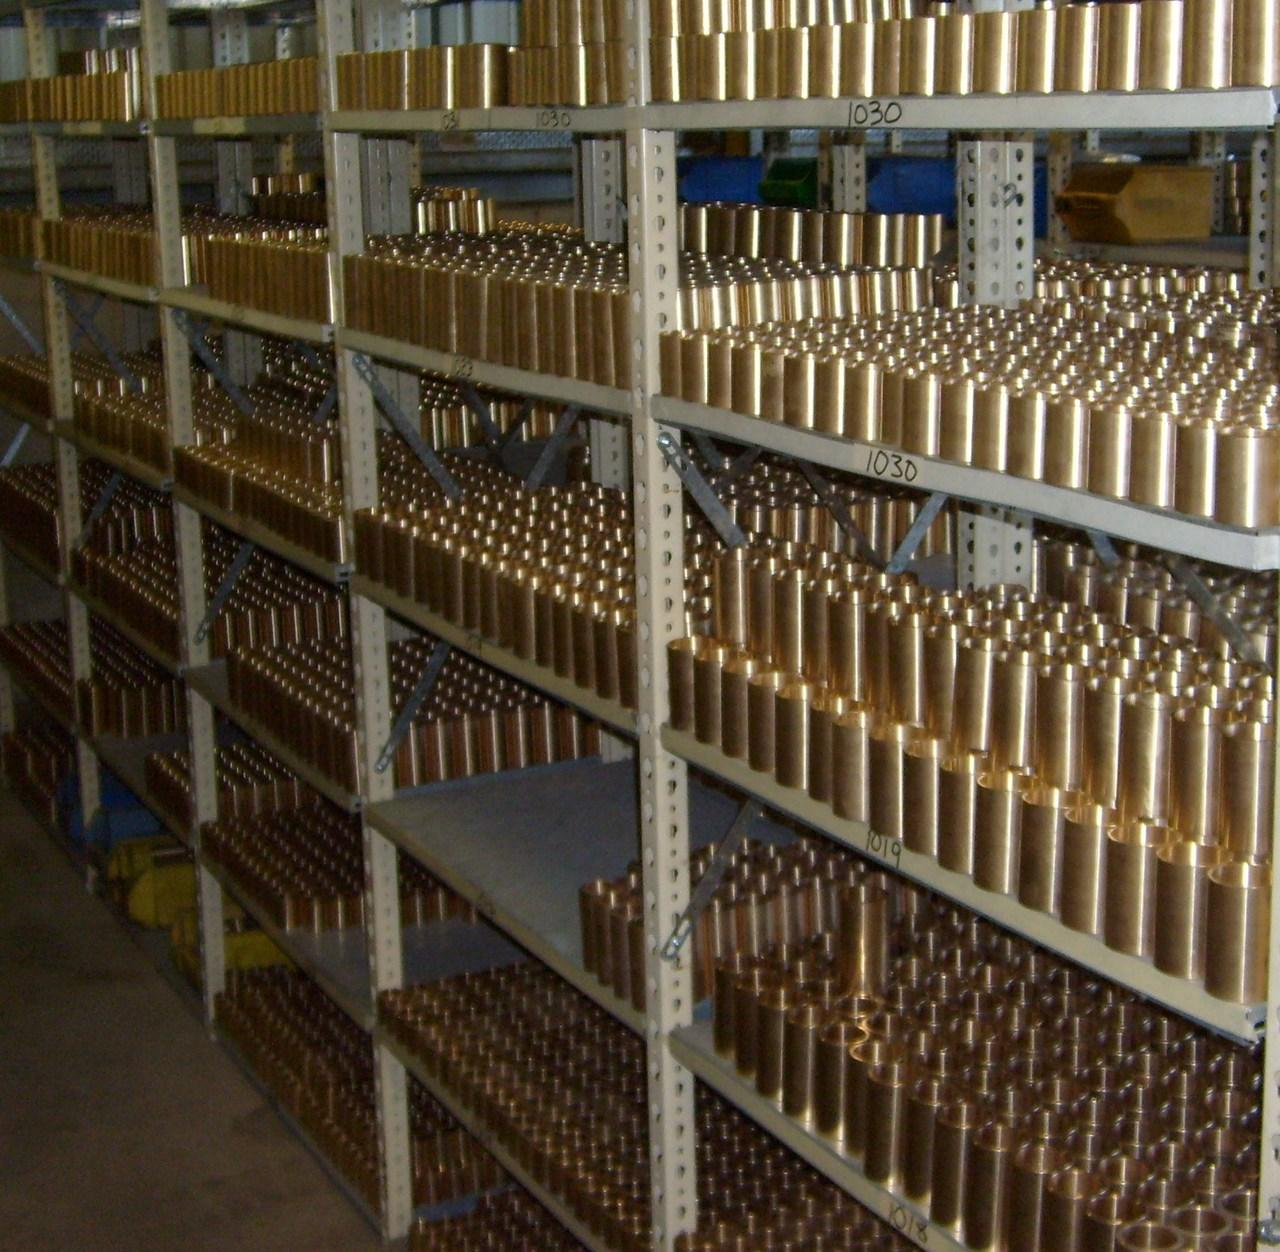 Втулка бронзовая БРАЖ9-4, ОЦС555, БРКМЦ, БрО10Ф1 доставка по Украине.